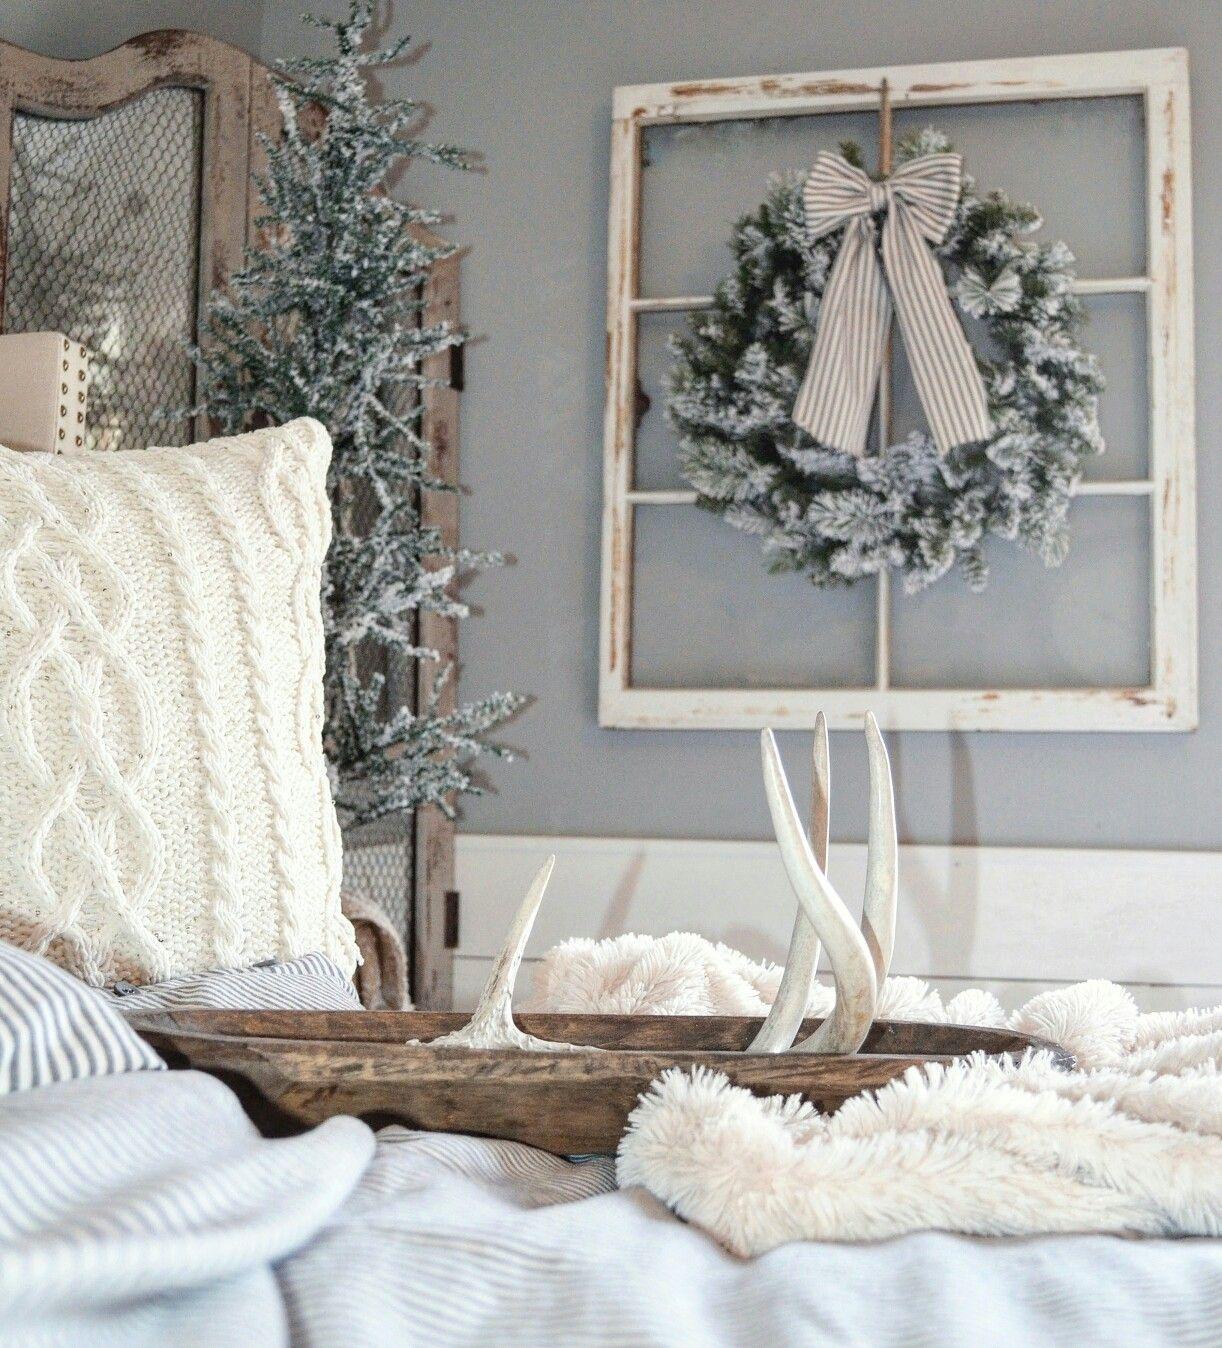 Winter Bedroom Decorfarmhouse Style Bedroomblessed_Ranch Cool Farmhouse Style Bedroom Design Ideas